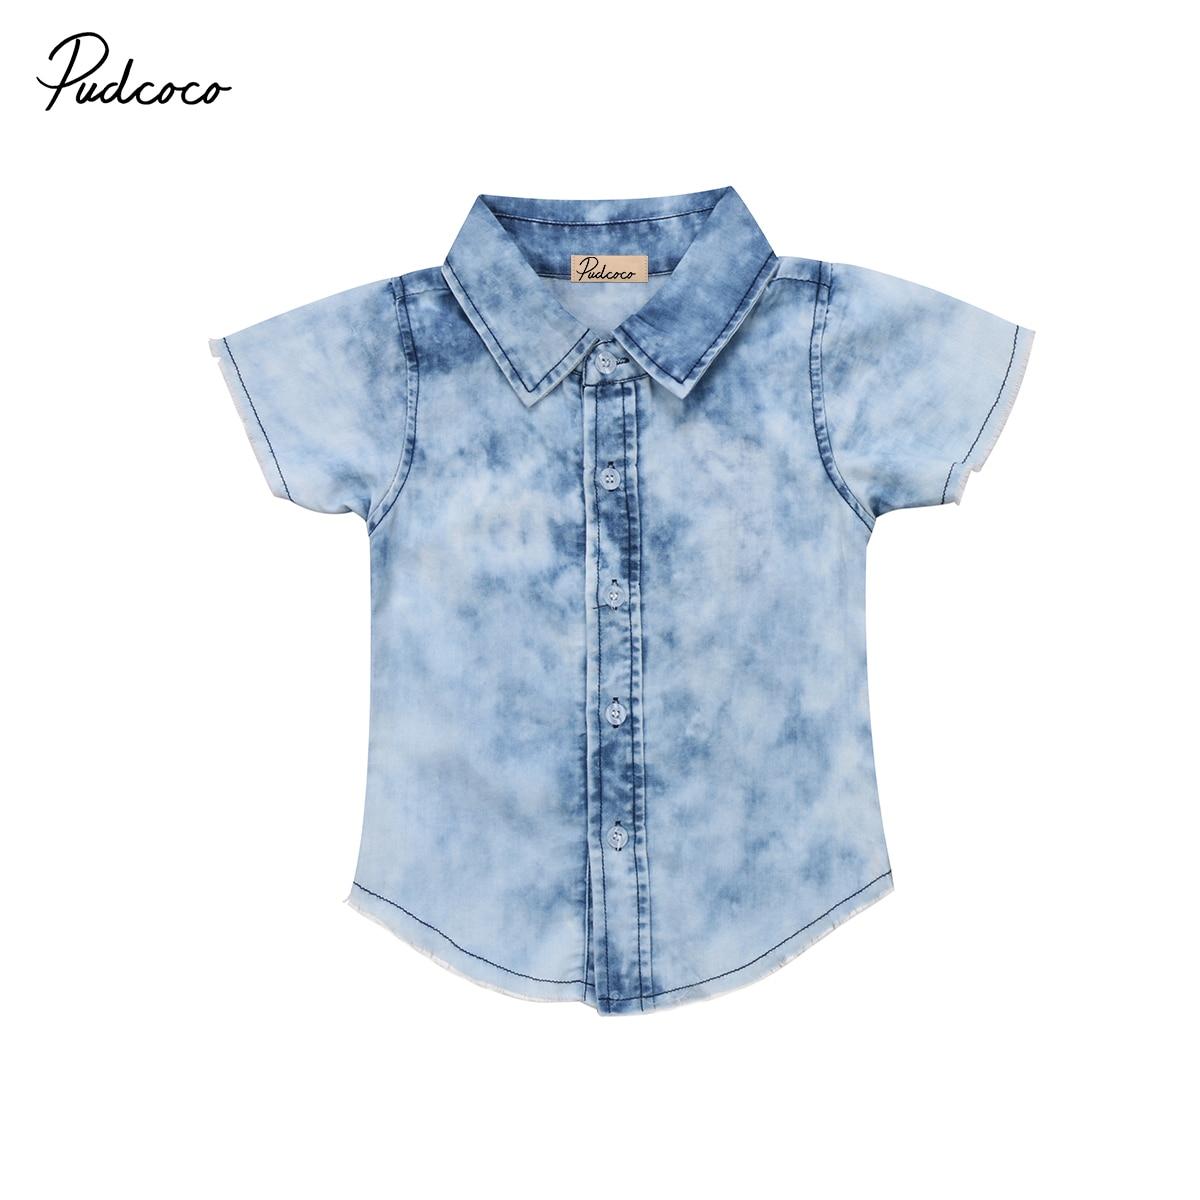 Shirts Kids Tops Short-Sleeve Print Newborn Toddler Baby-Boys Casual Fashion Jean Denim